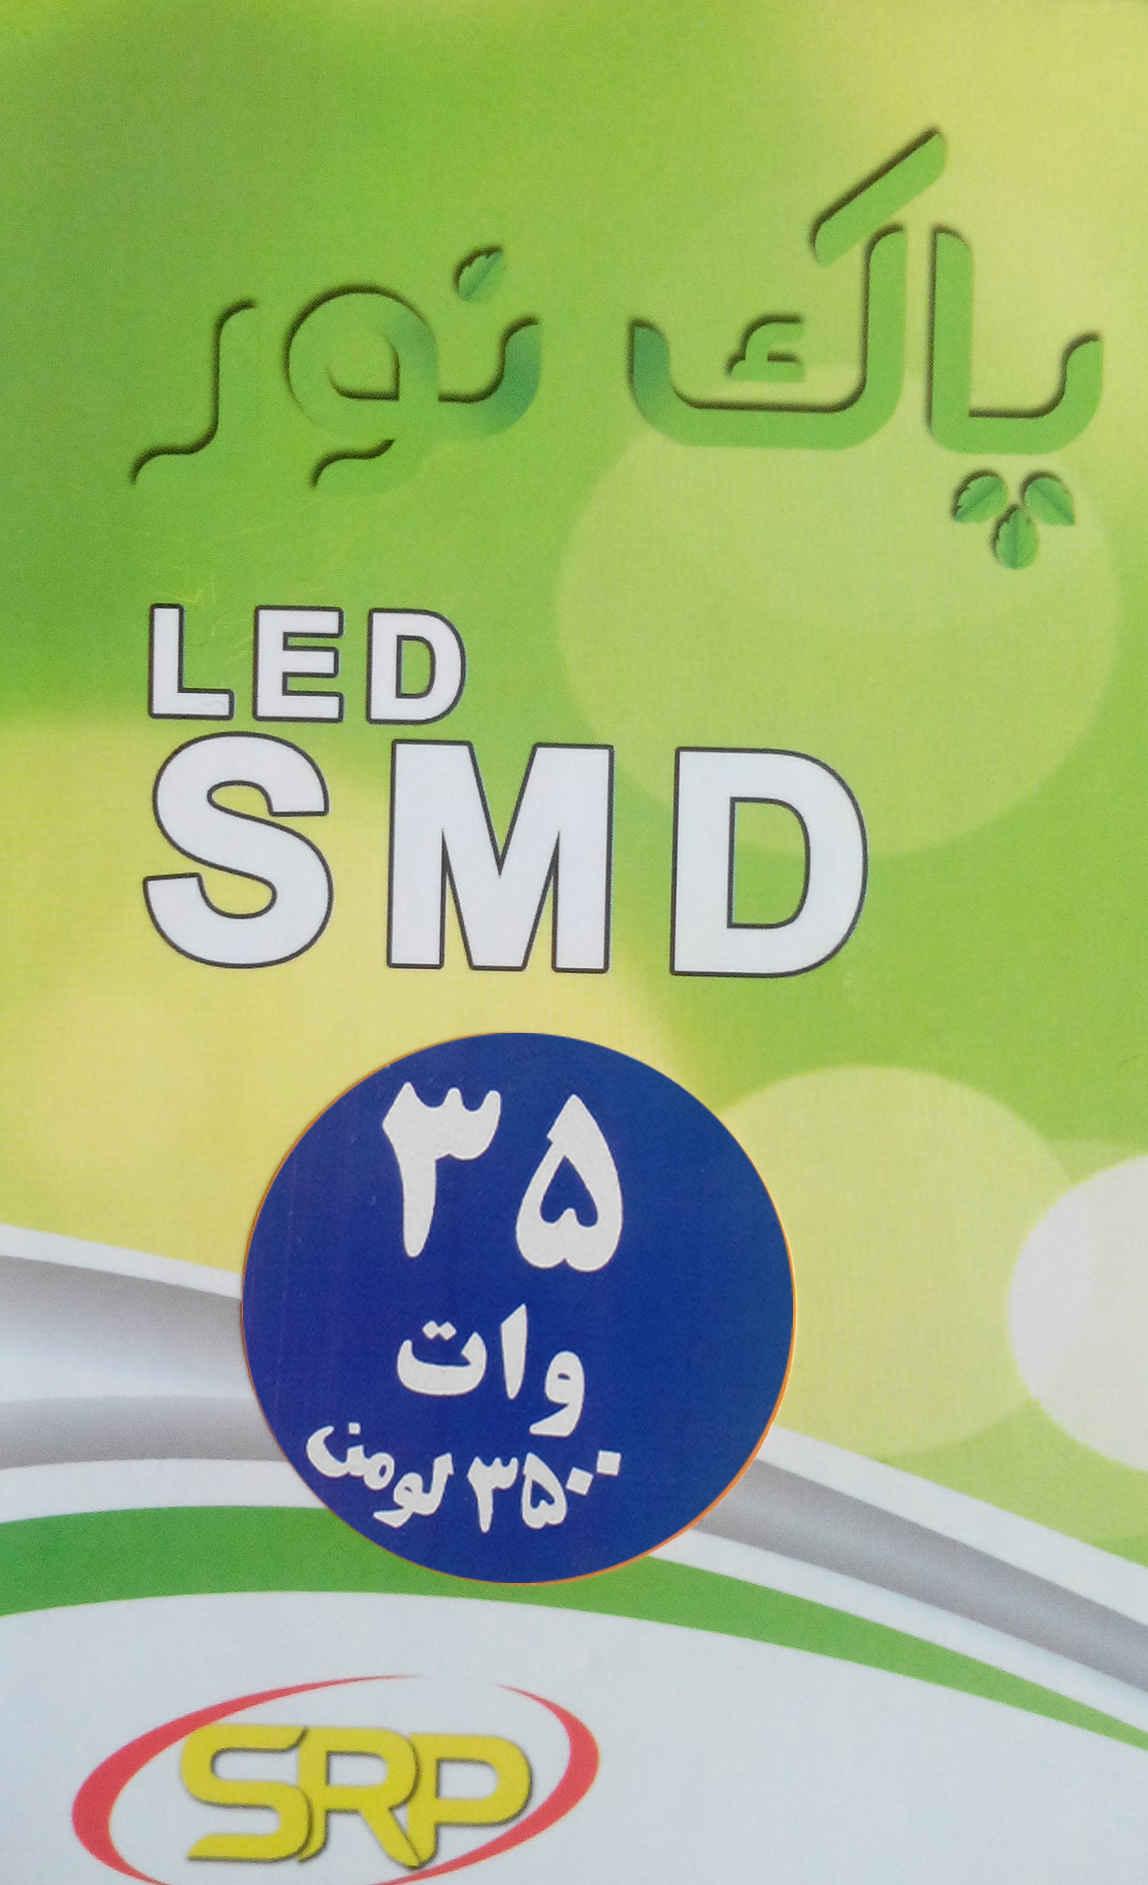 لامپ اس ام دی پاک نور 35 وات